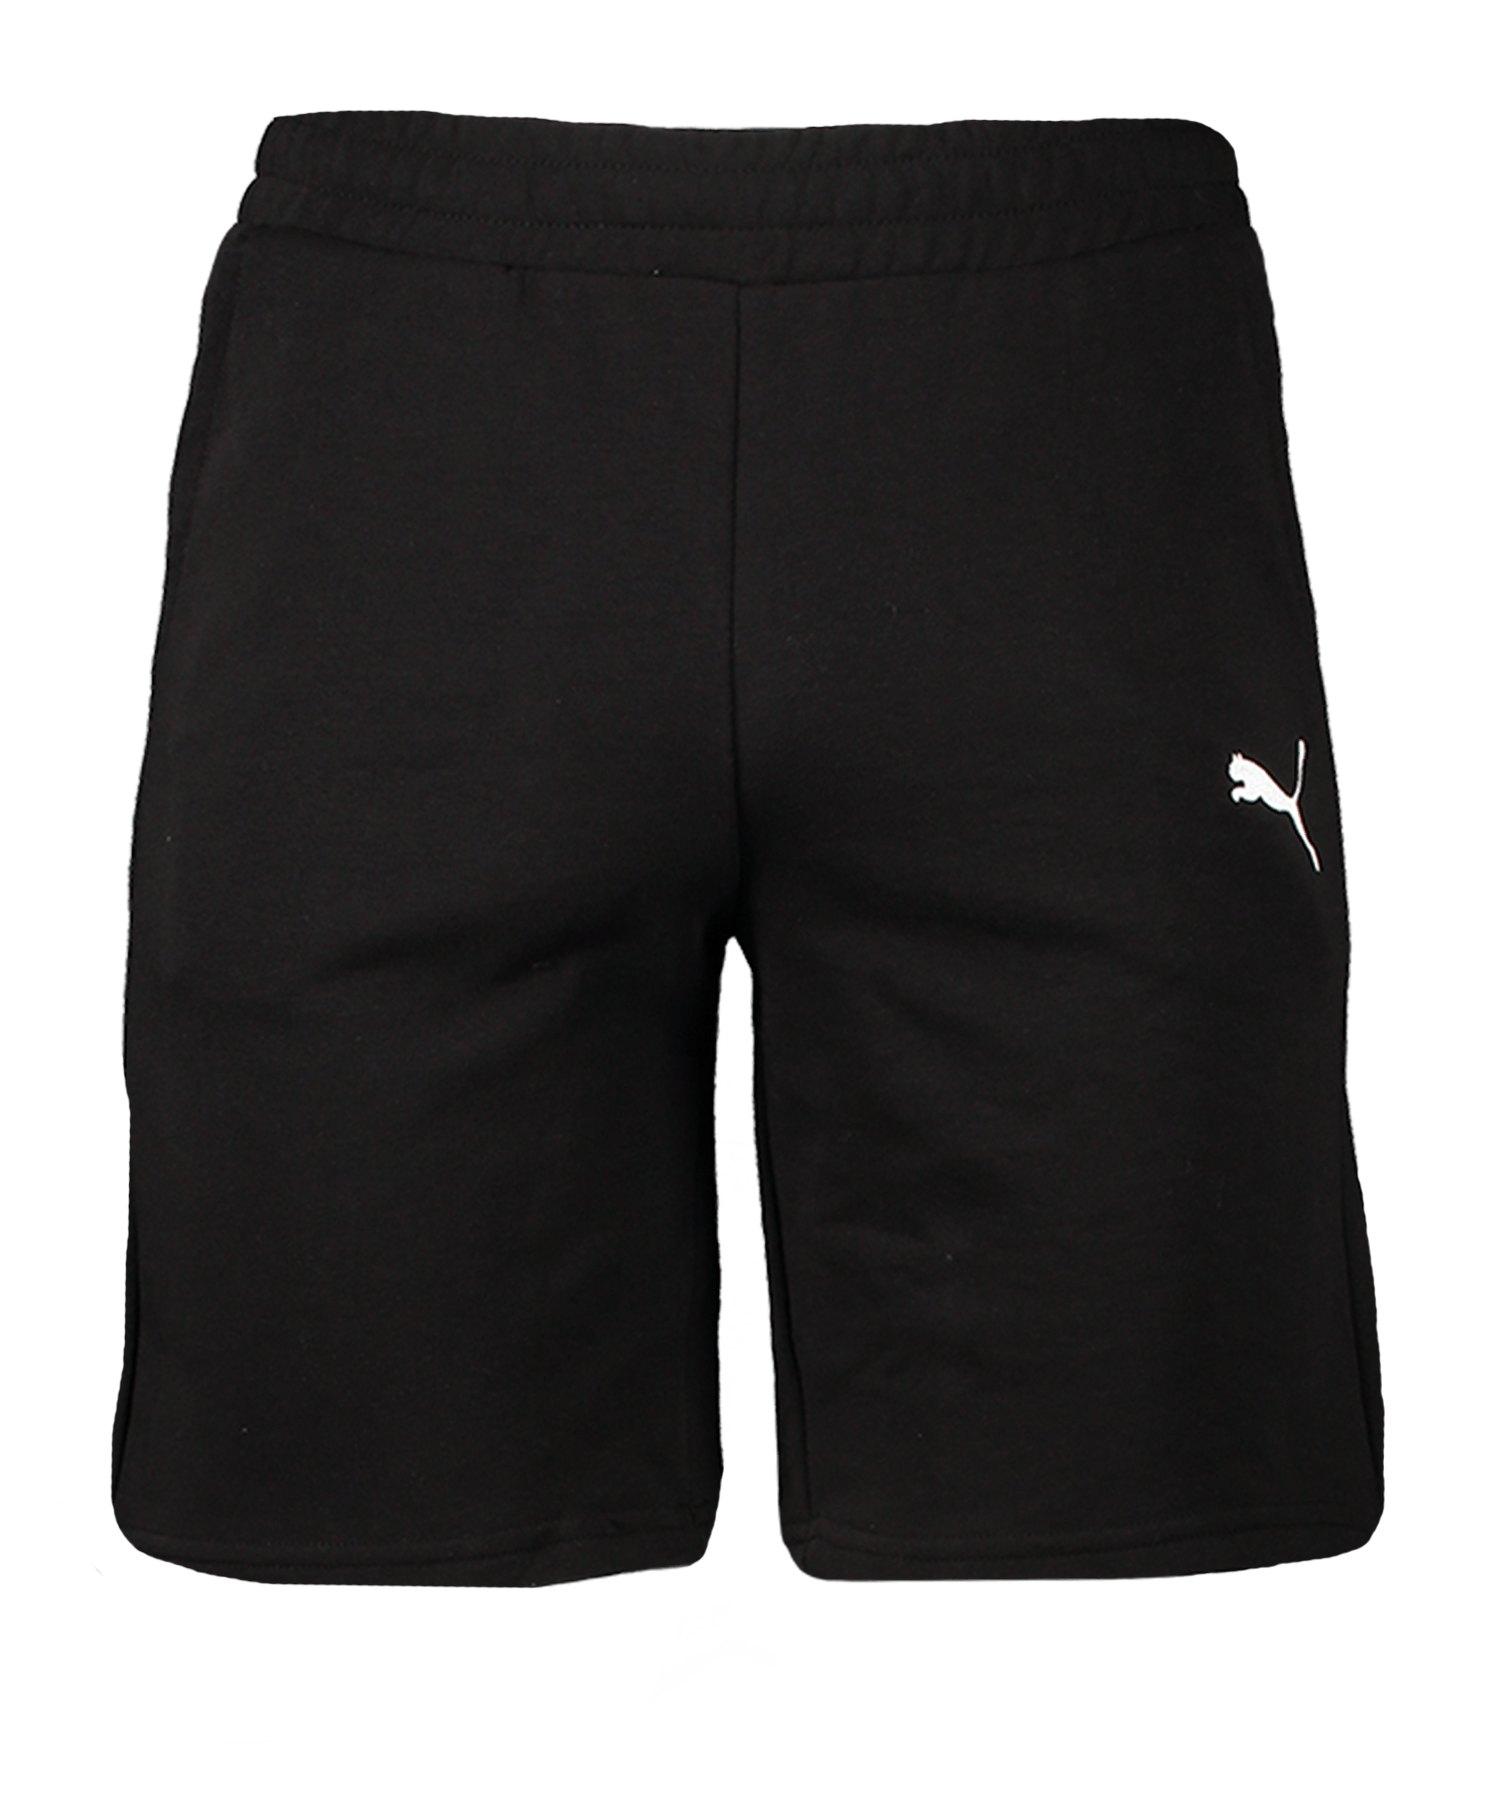 PUMA teamGOAL 23 Casuals Shorts Schwarz F03 - schwarz